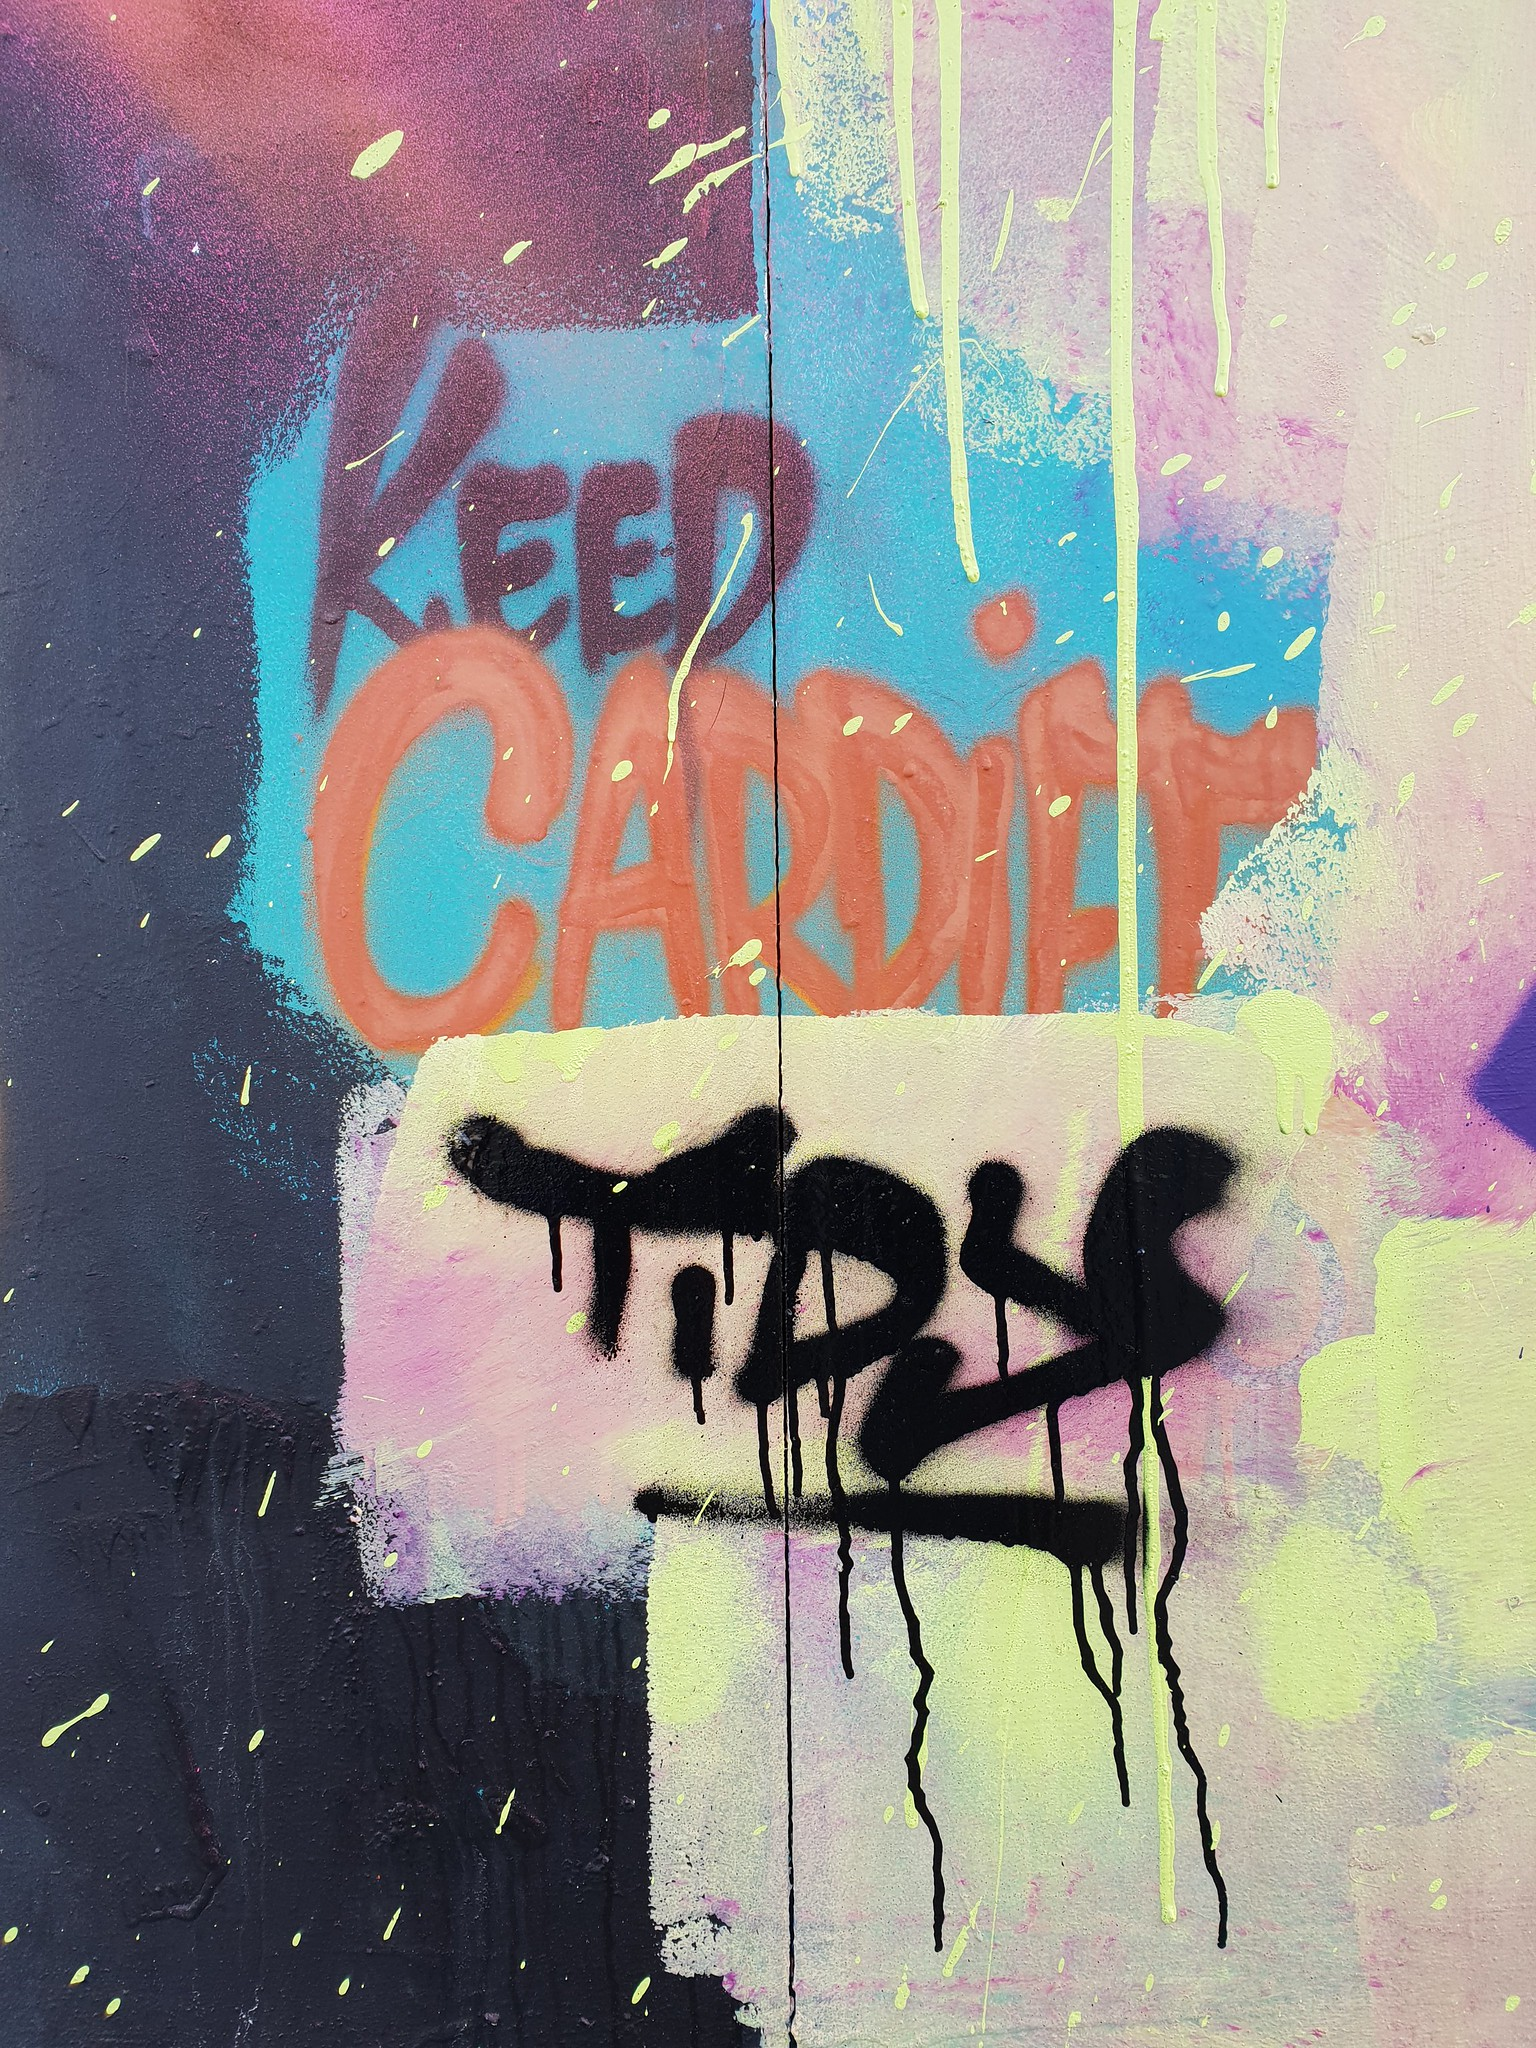 Millennium walkay Street art, Cardiff